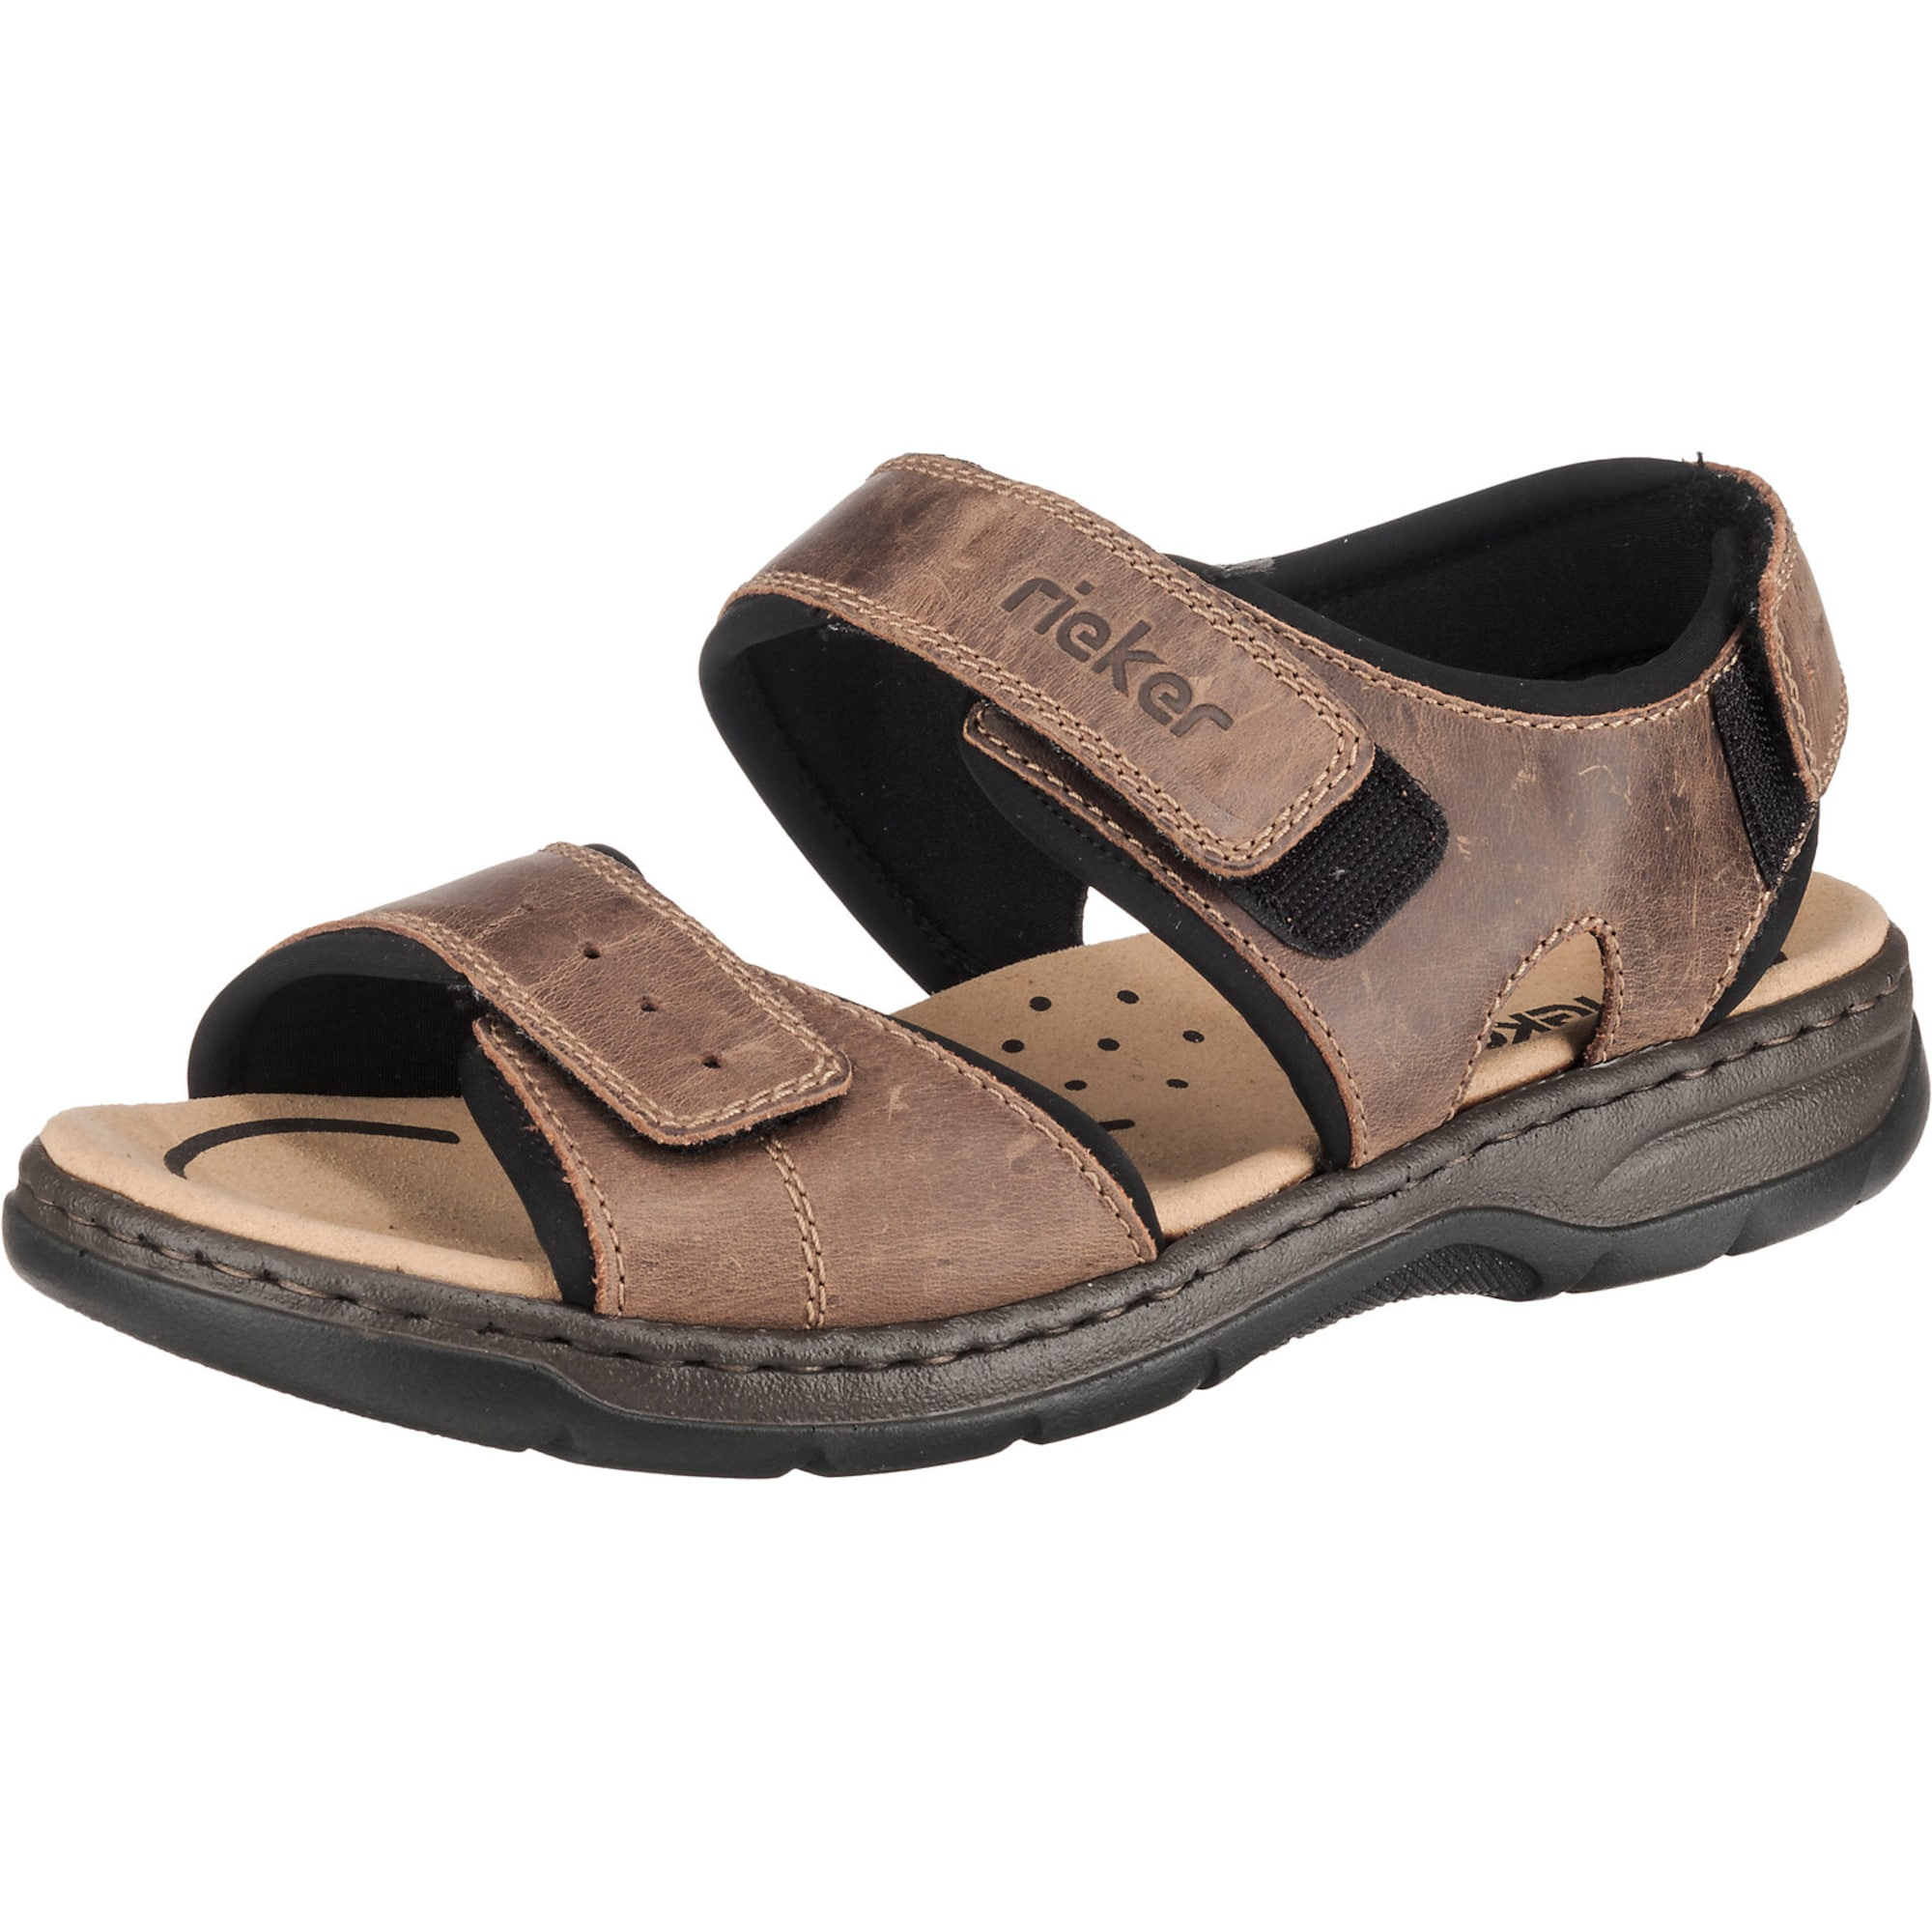 Sandale   Schuhe > Sandalen & Zehentrenner   Rieker